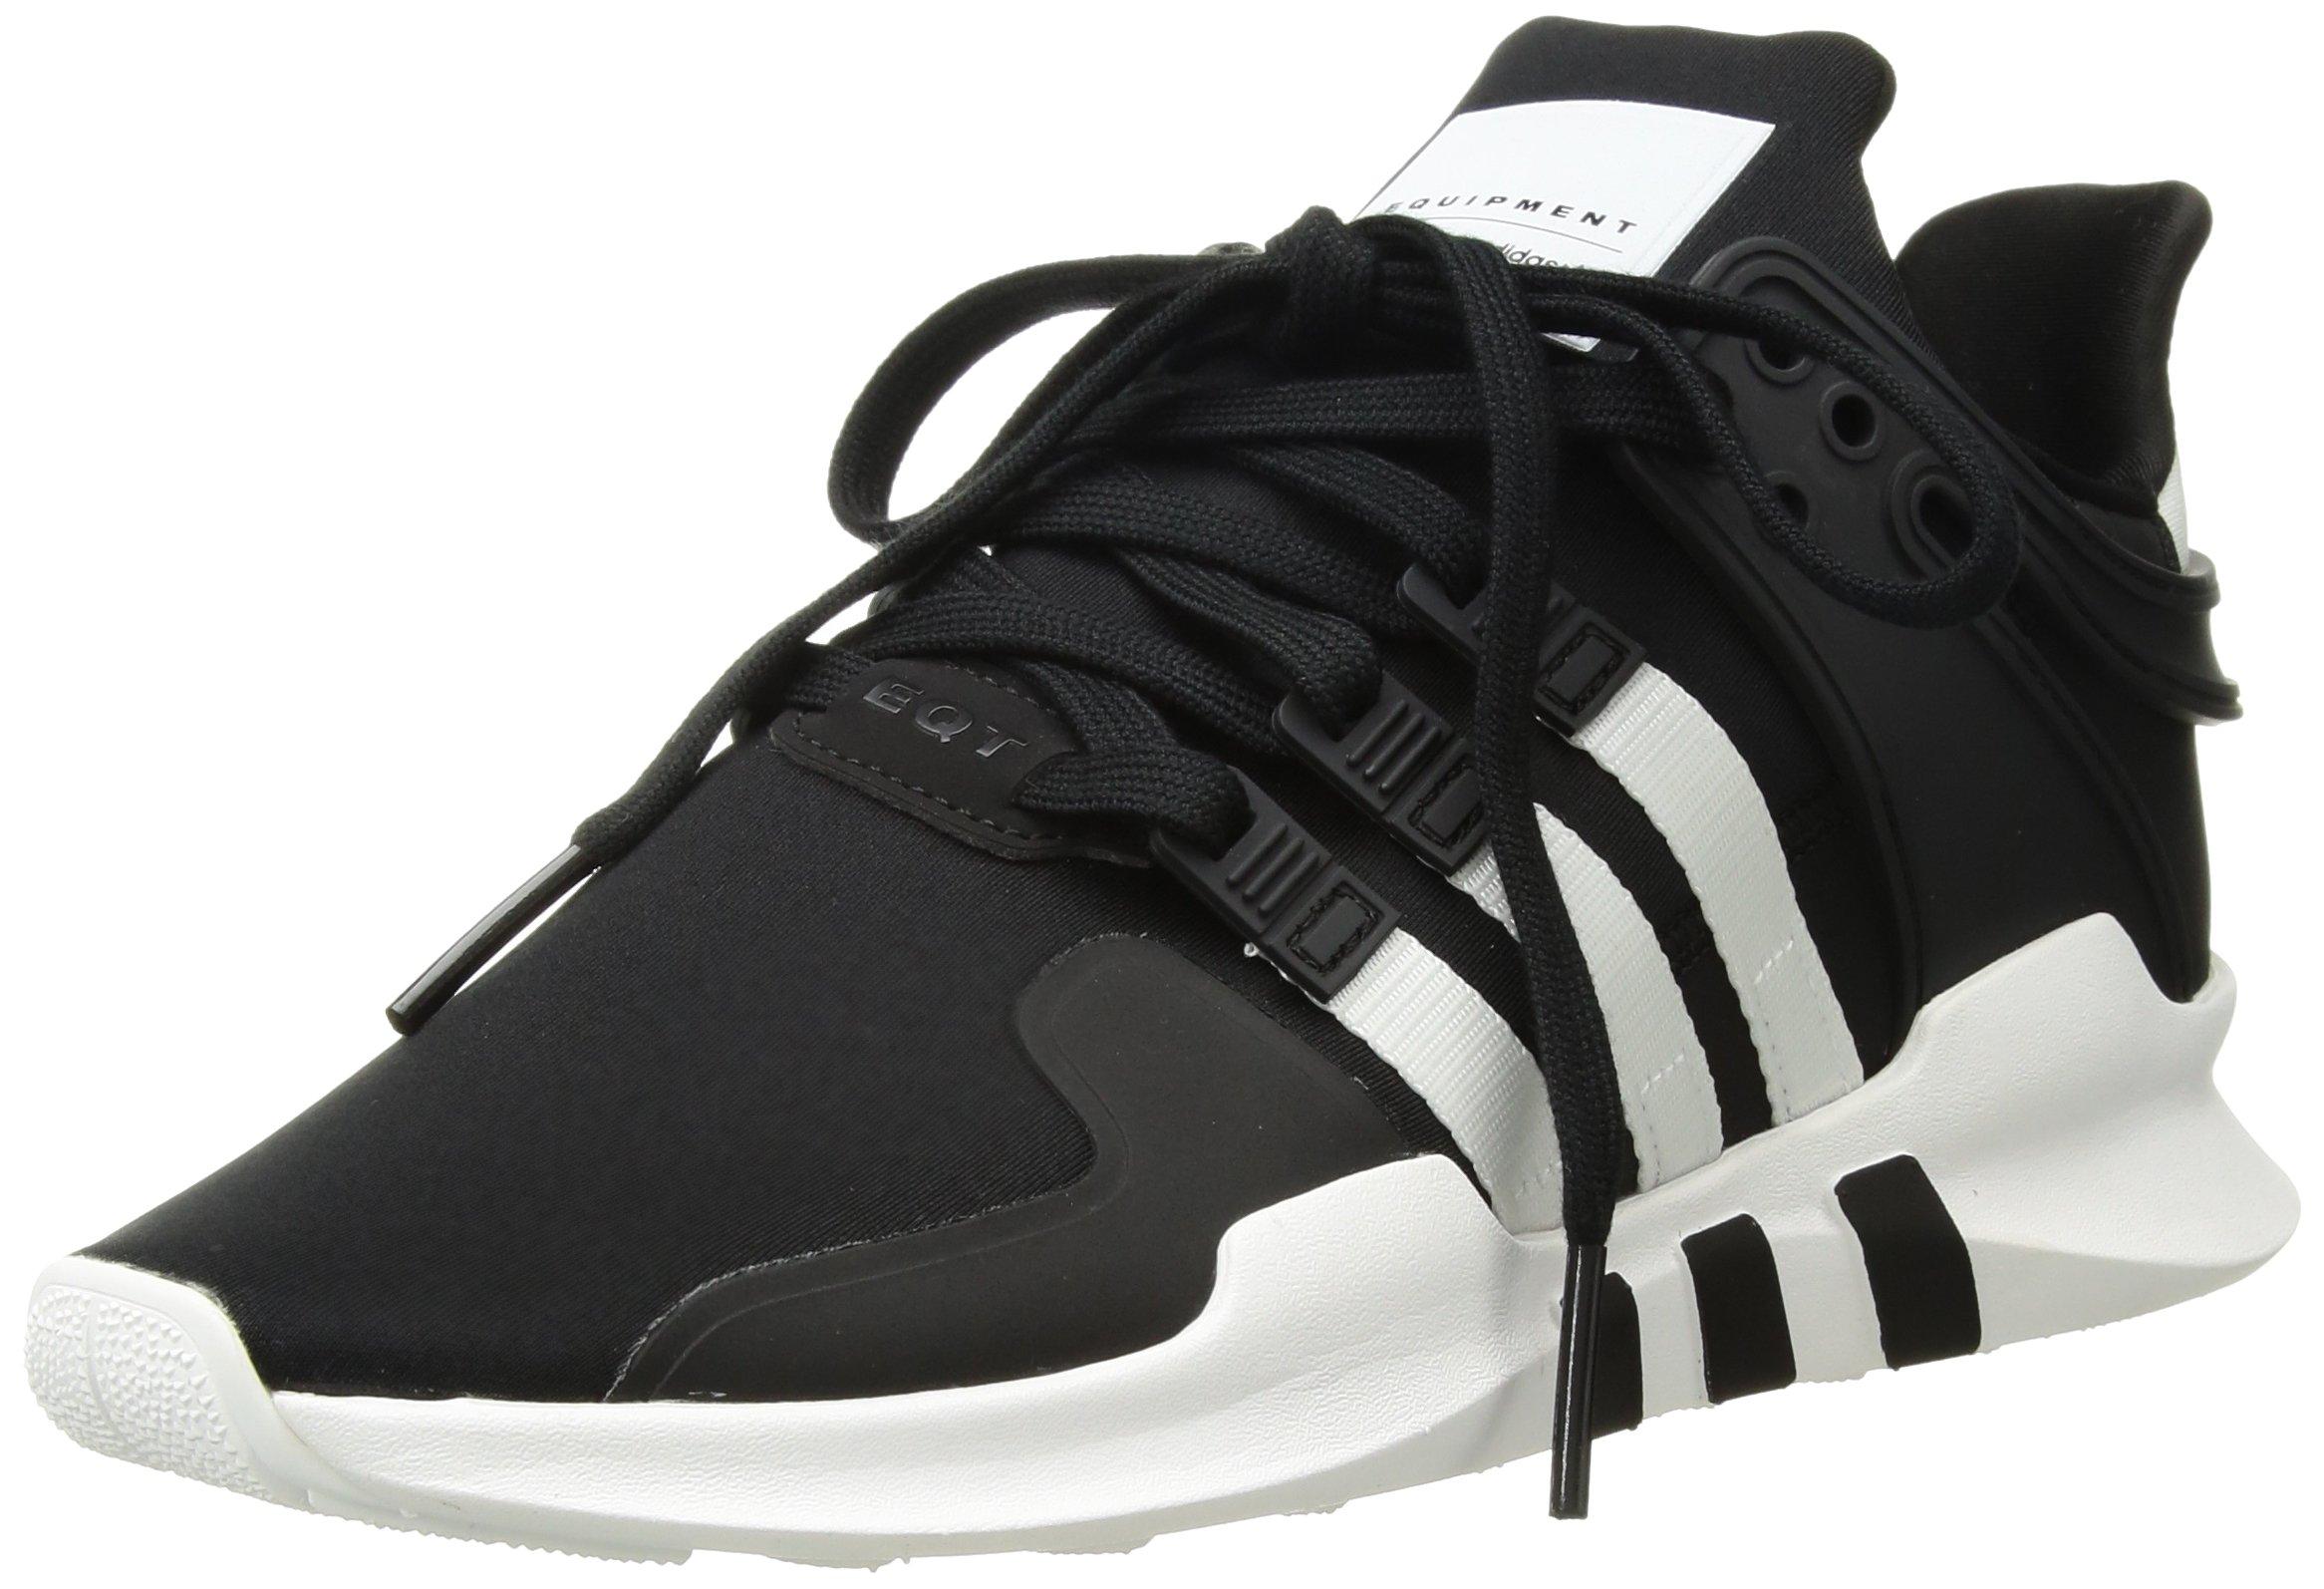 best service cf296 e82e5 Galleon - Adidas Mens Eqt Support Adv Fashion Sneaker,blackwhiteblack,5  M US